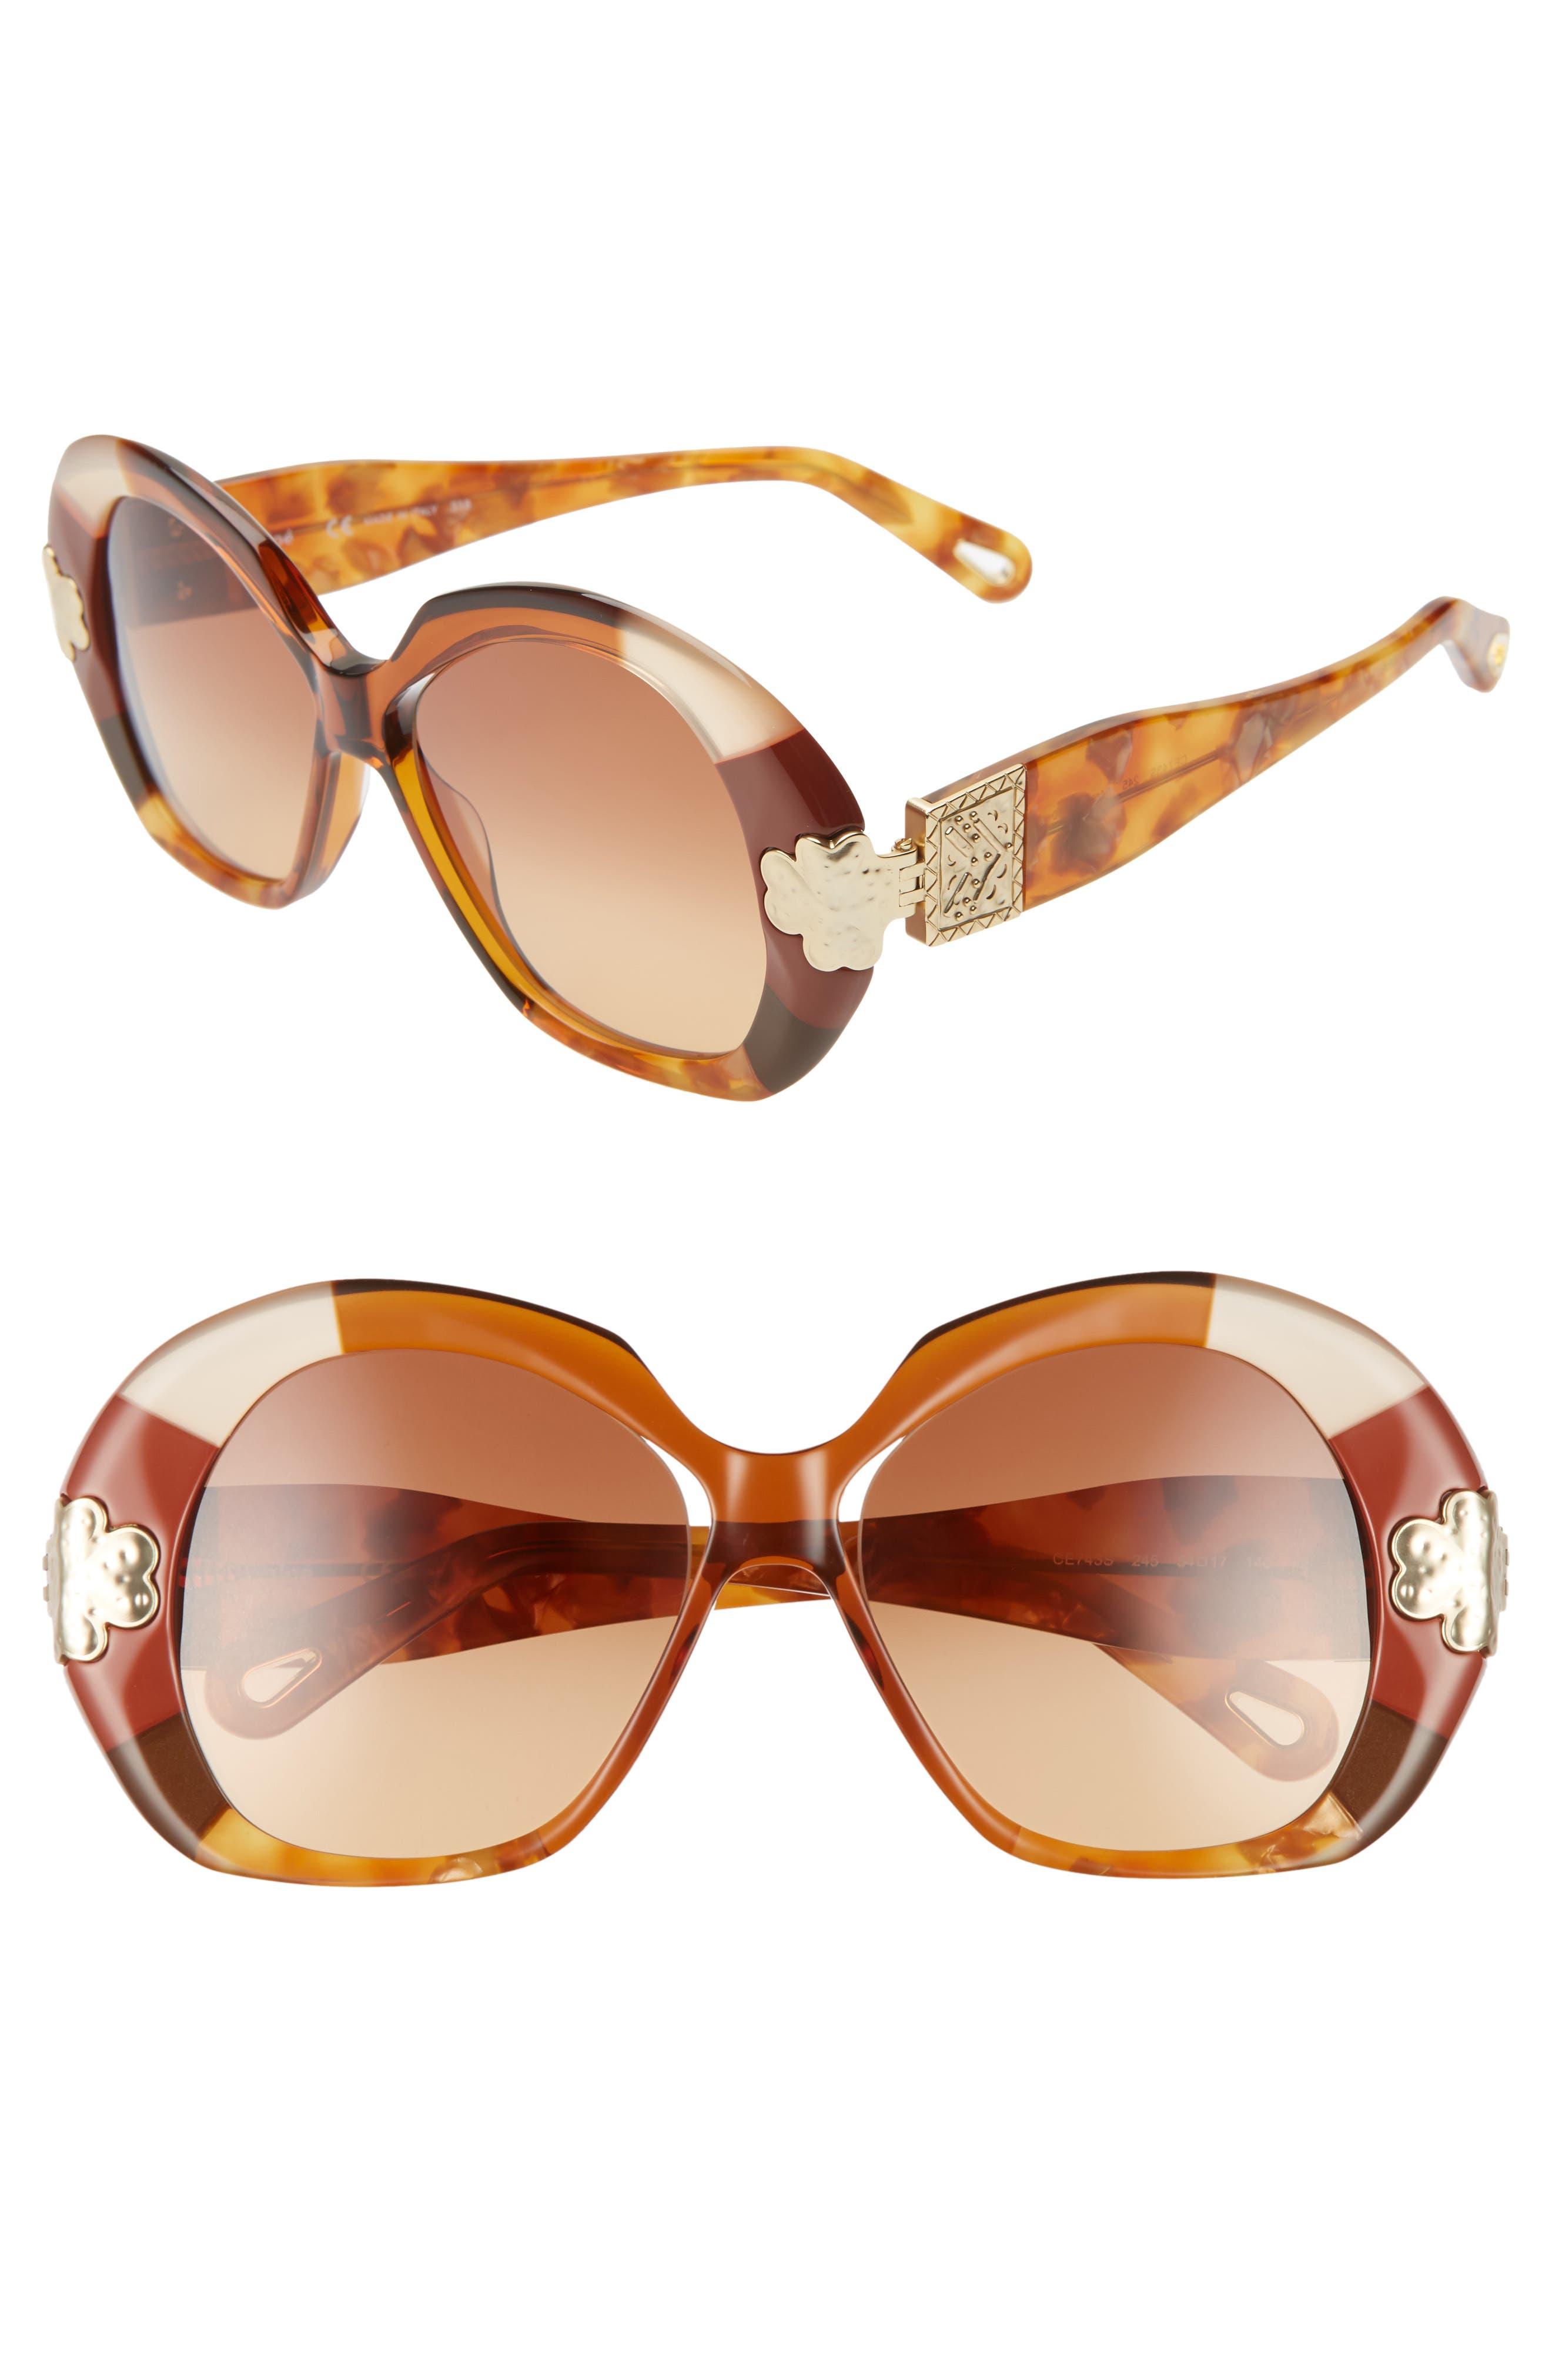 Chloe 5m Oval Sunglasses - Gold Patchwork